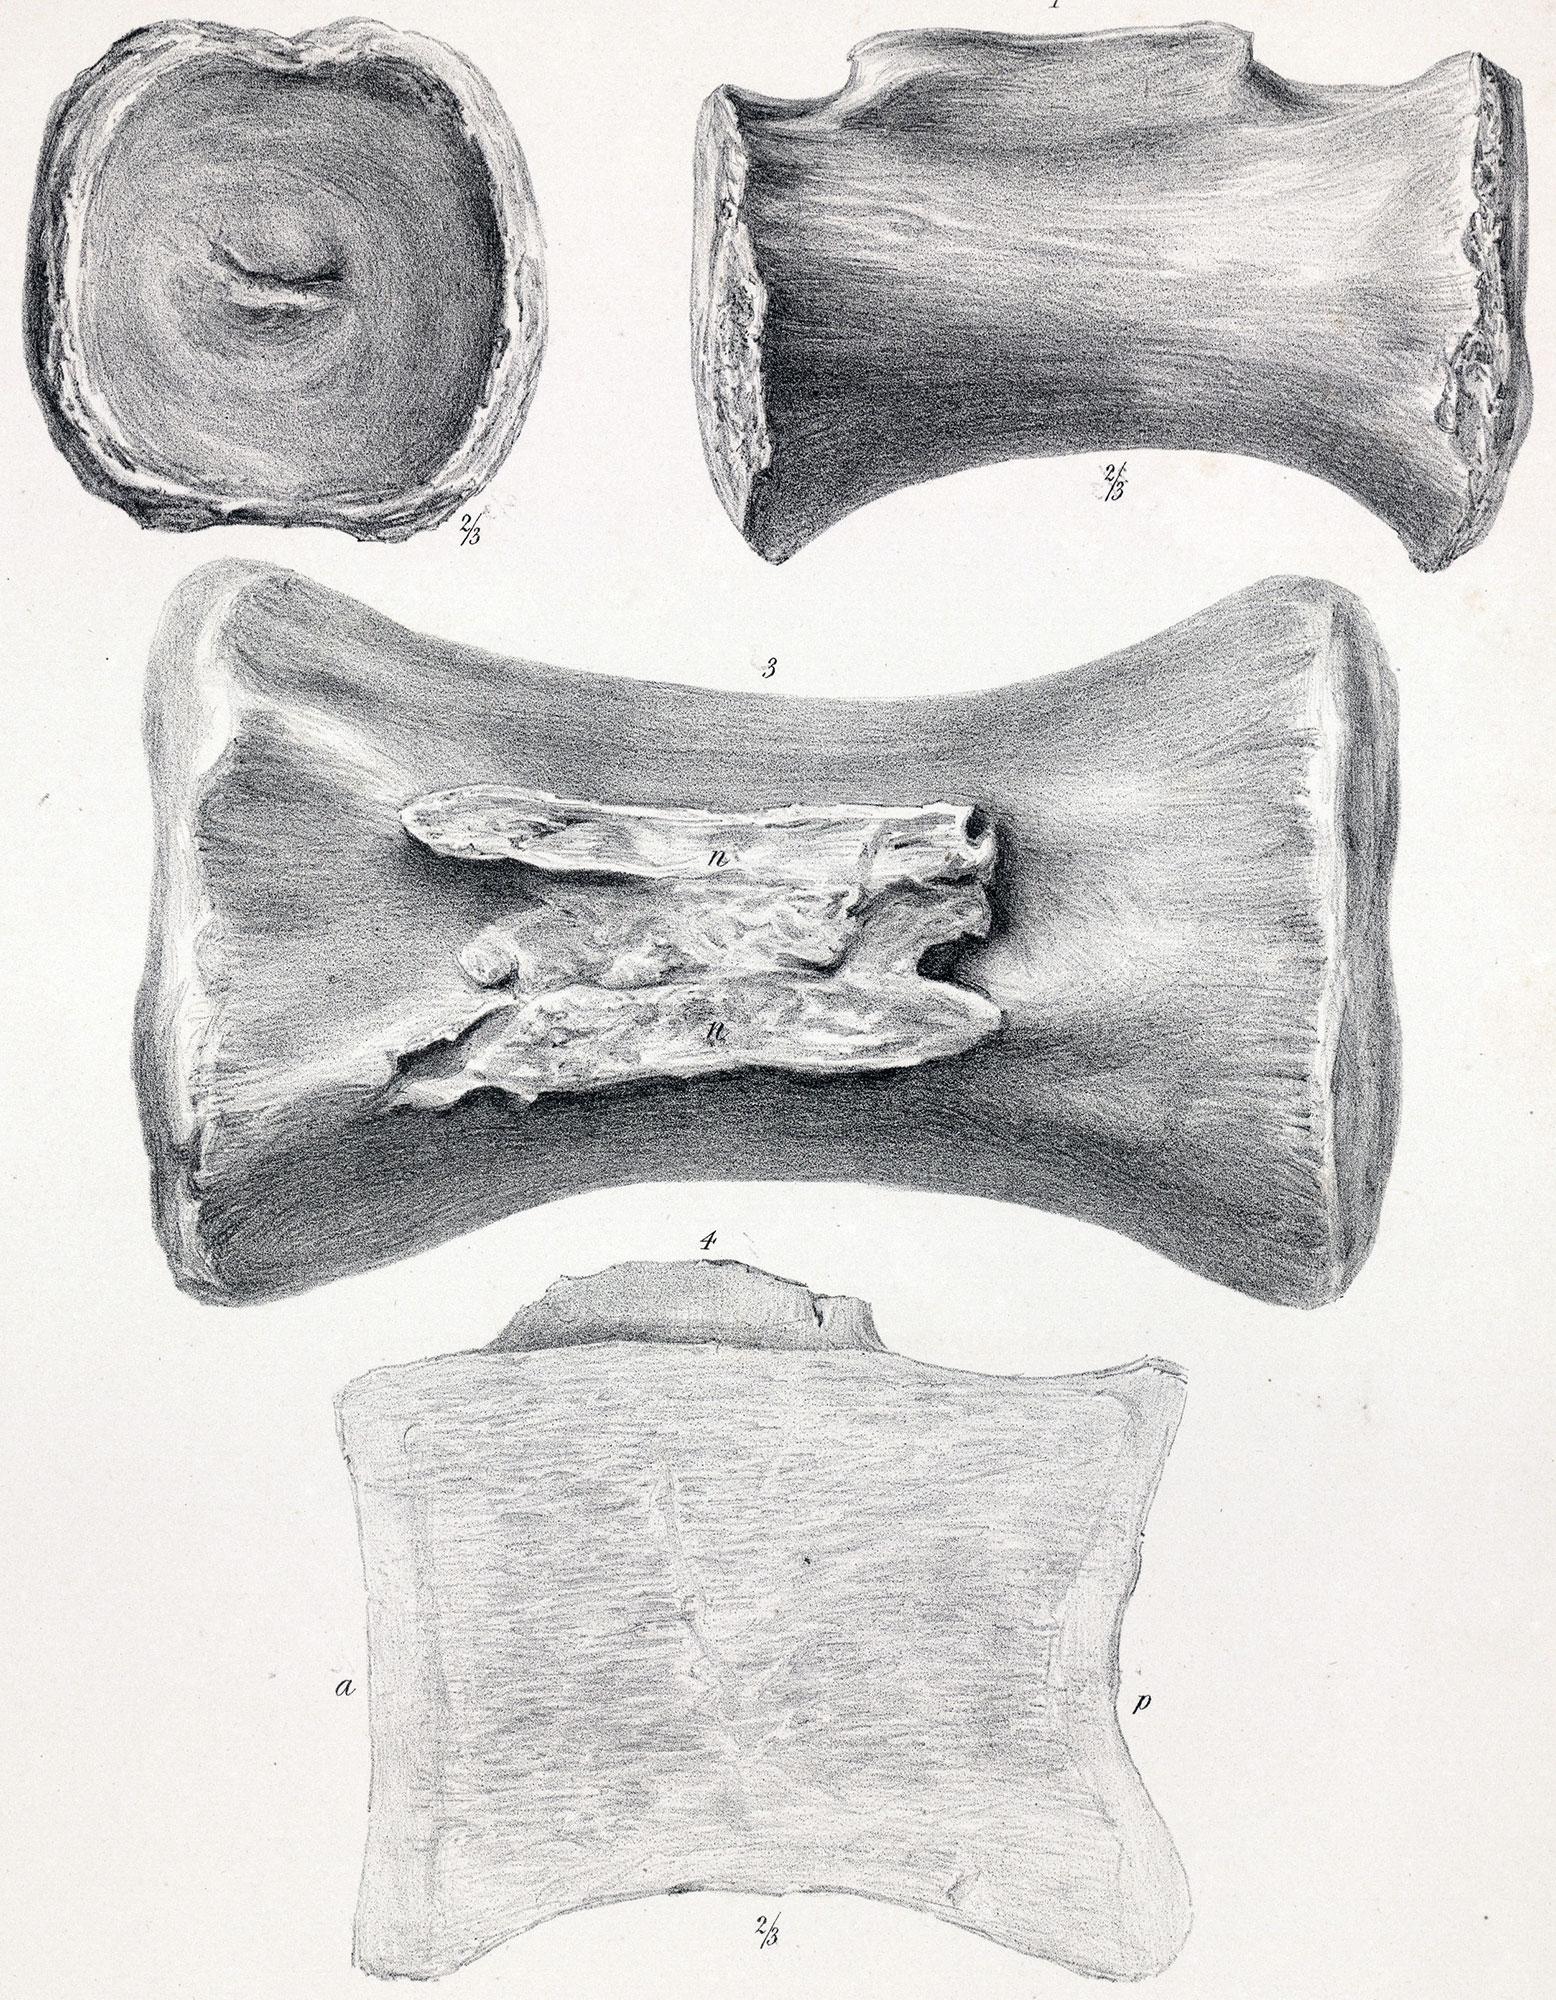 Cetiosaurus oxoniensis - Beschreibung, Dinodata.de